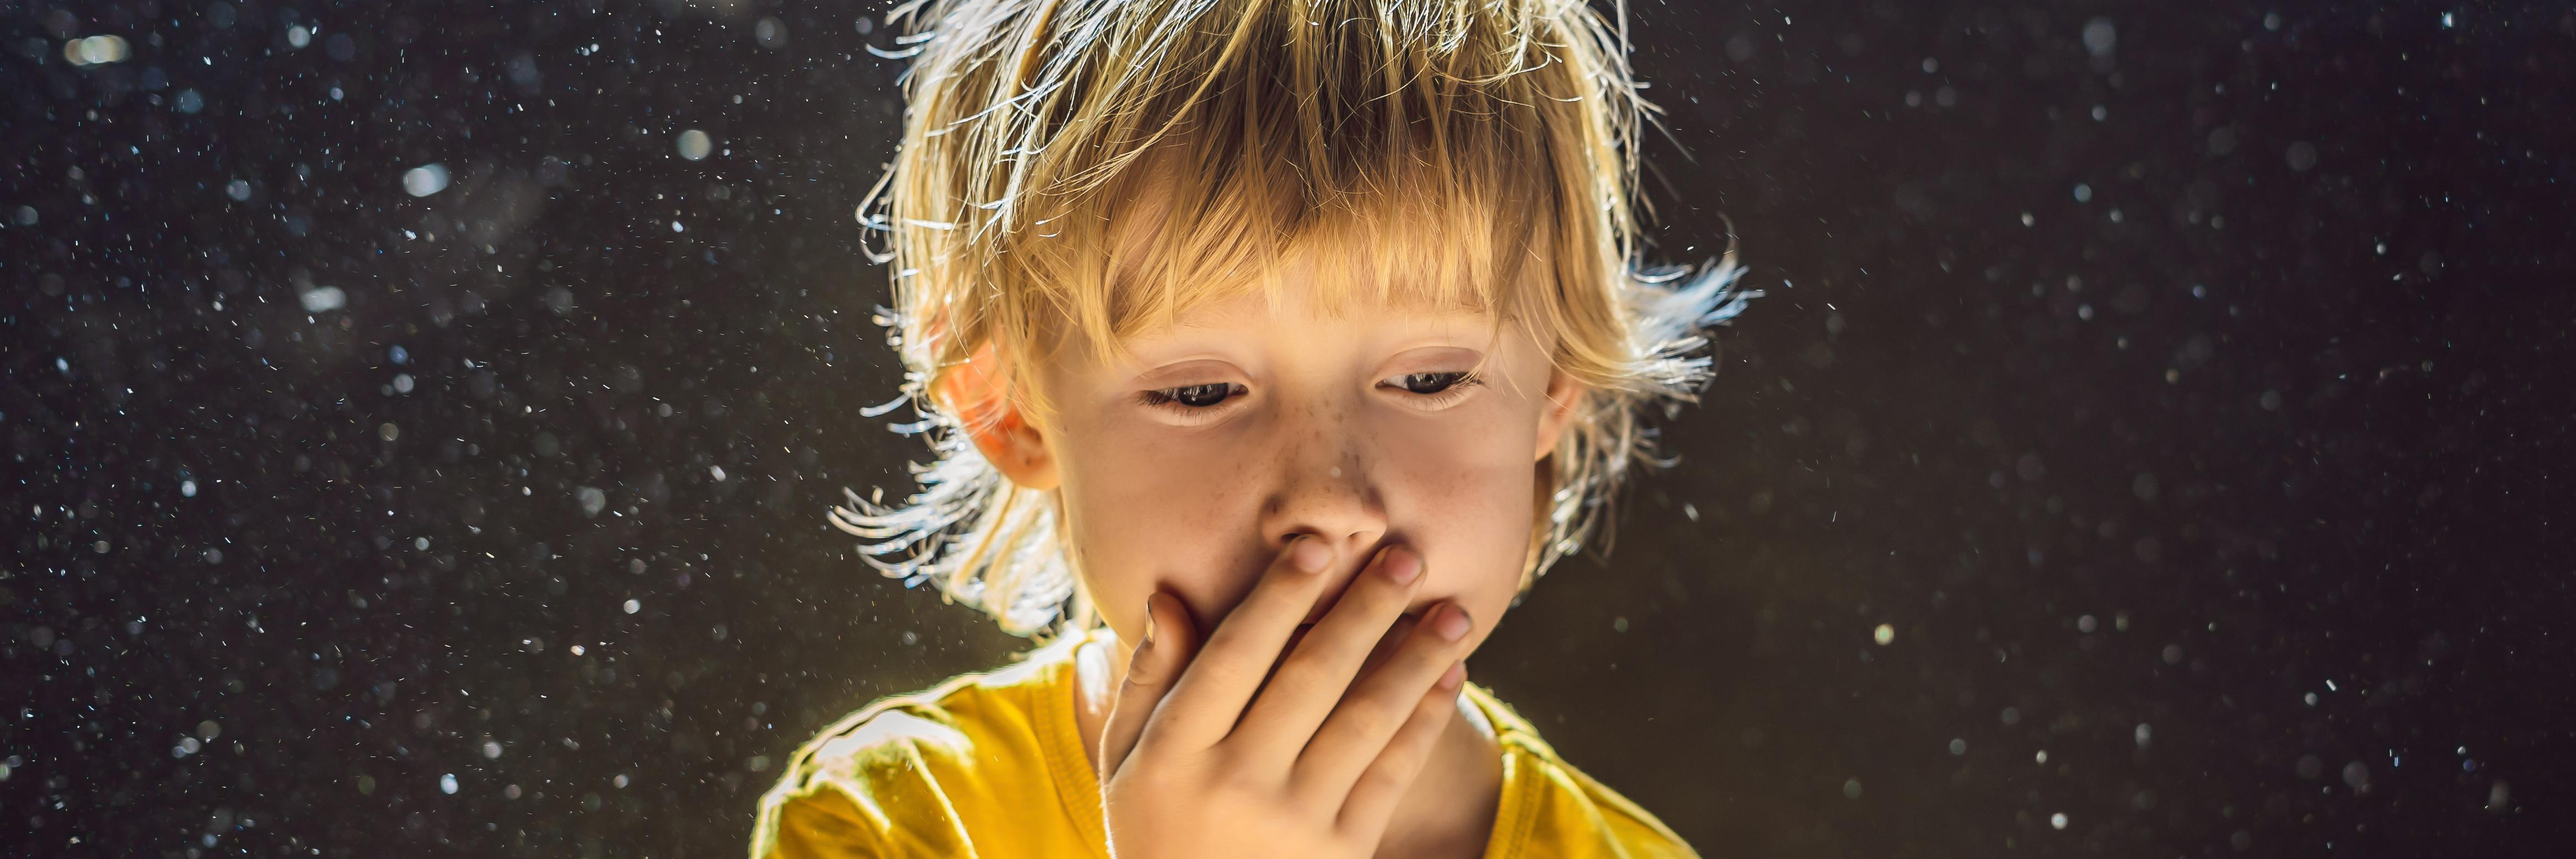 Porallergia - Poratka allergia